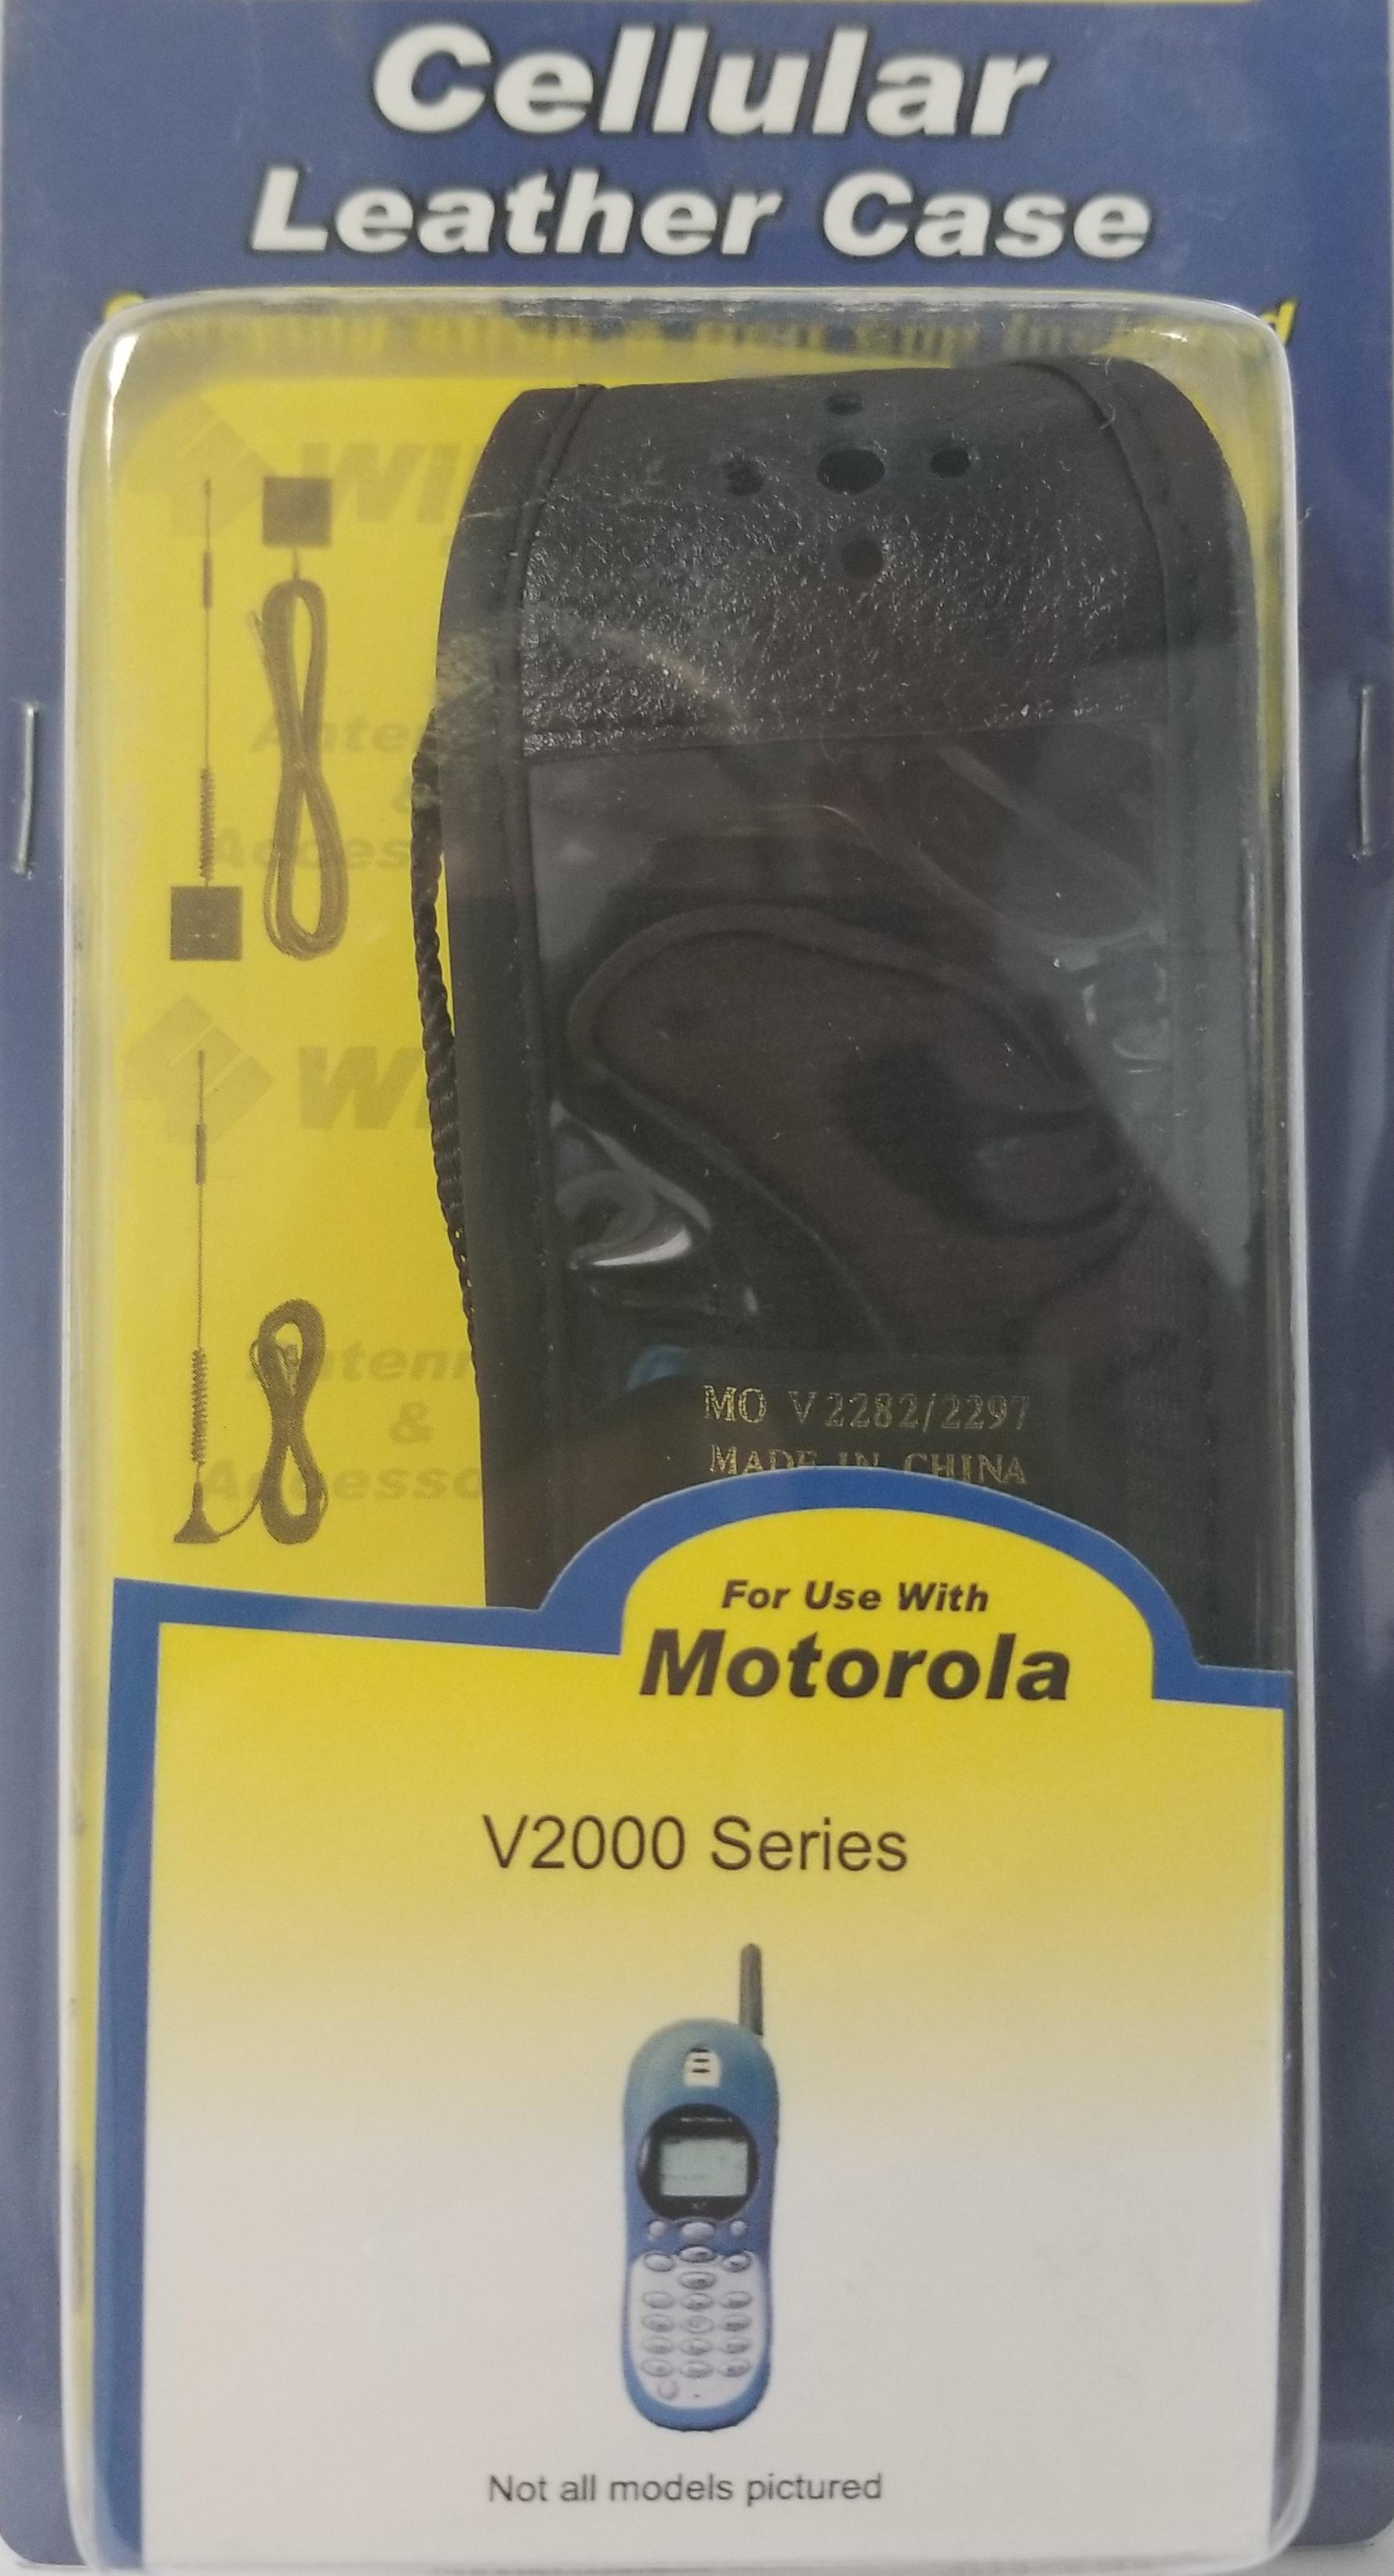 301181 - Motorola V2000 Series Leather Case